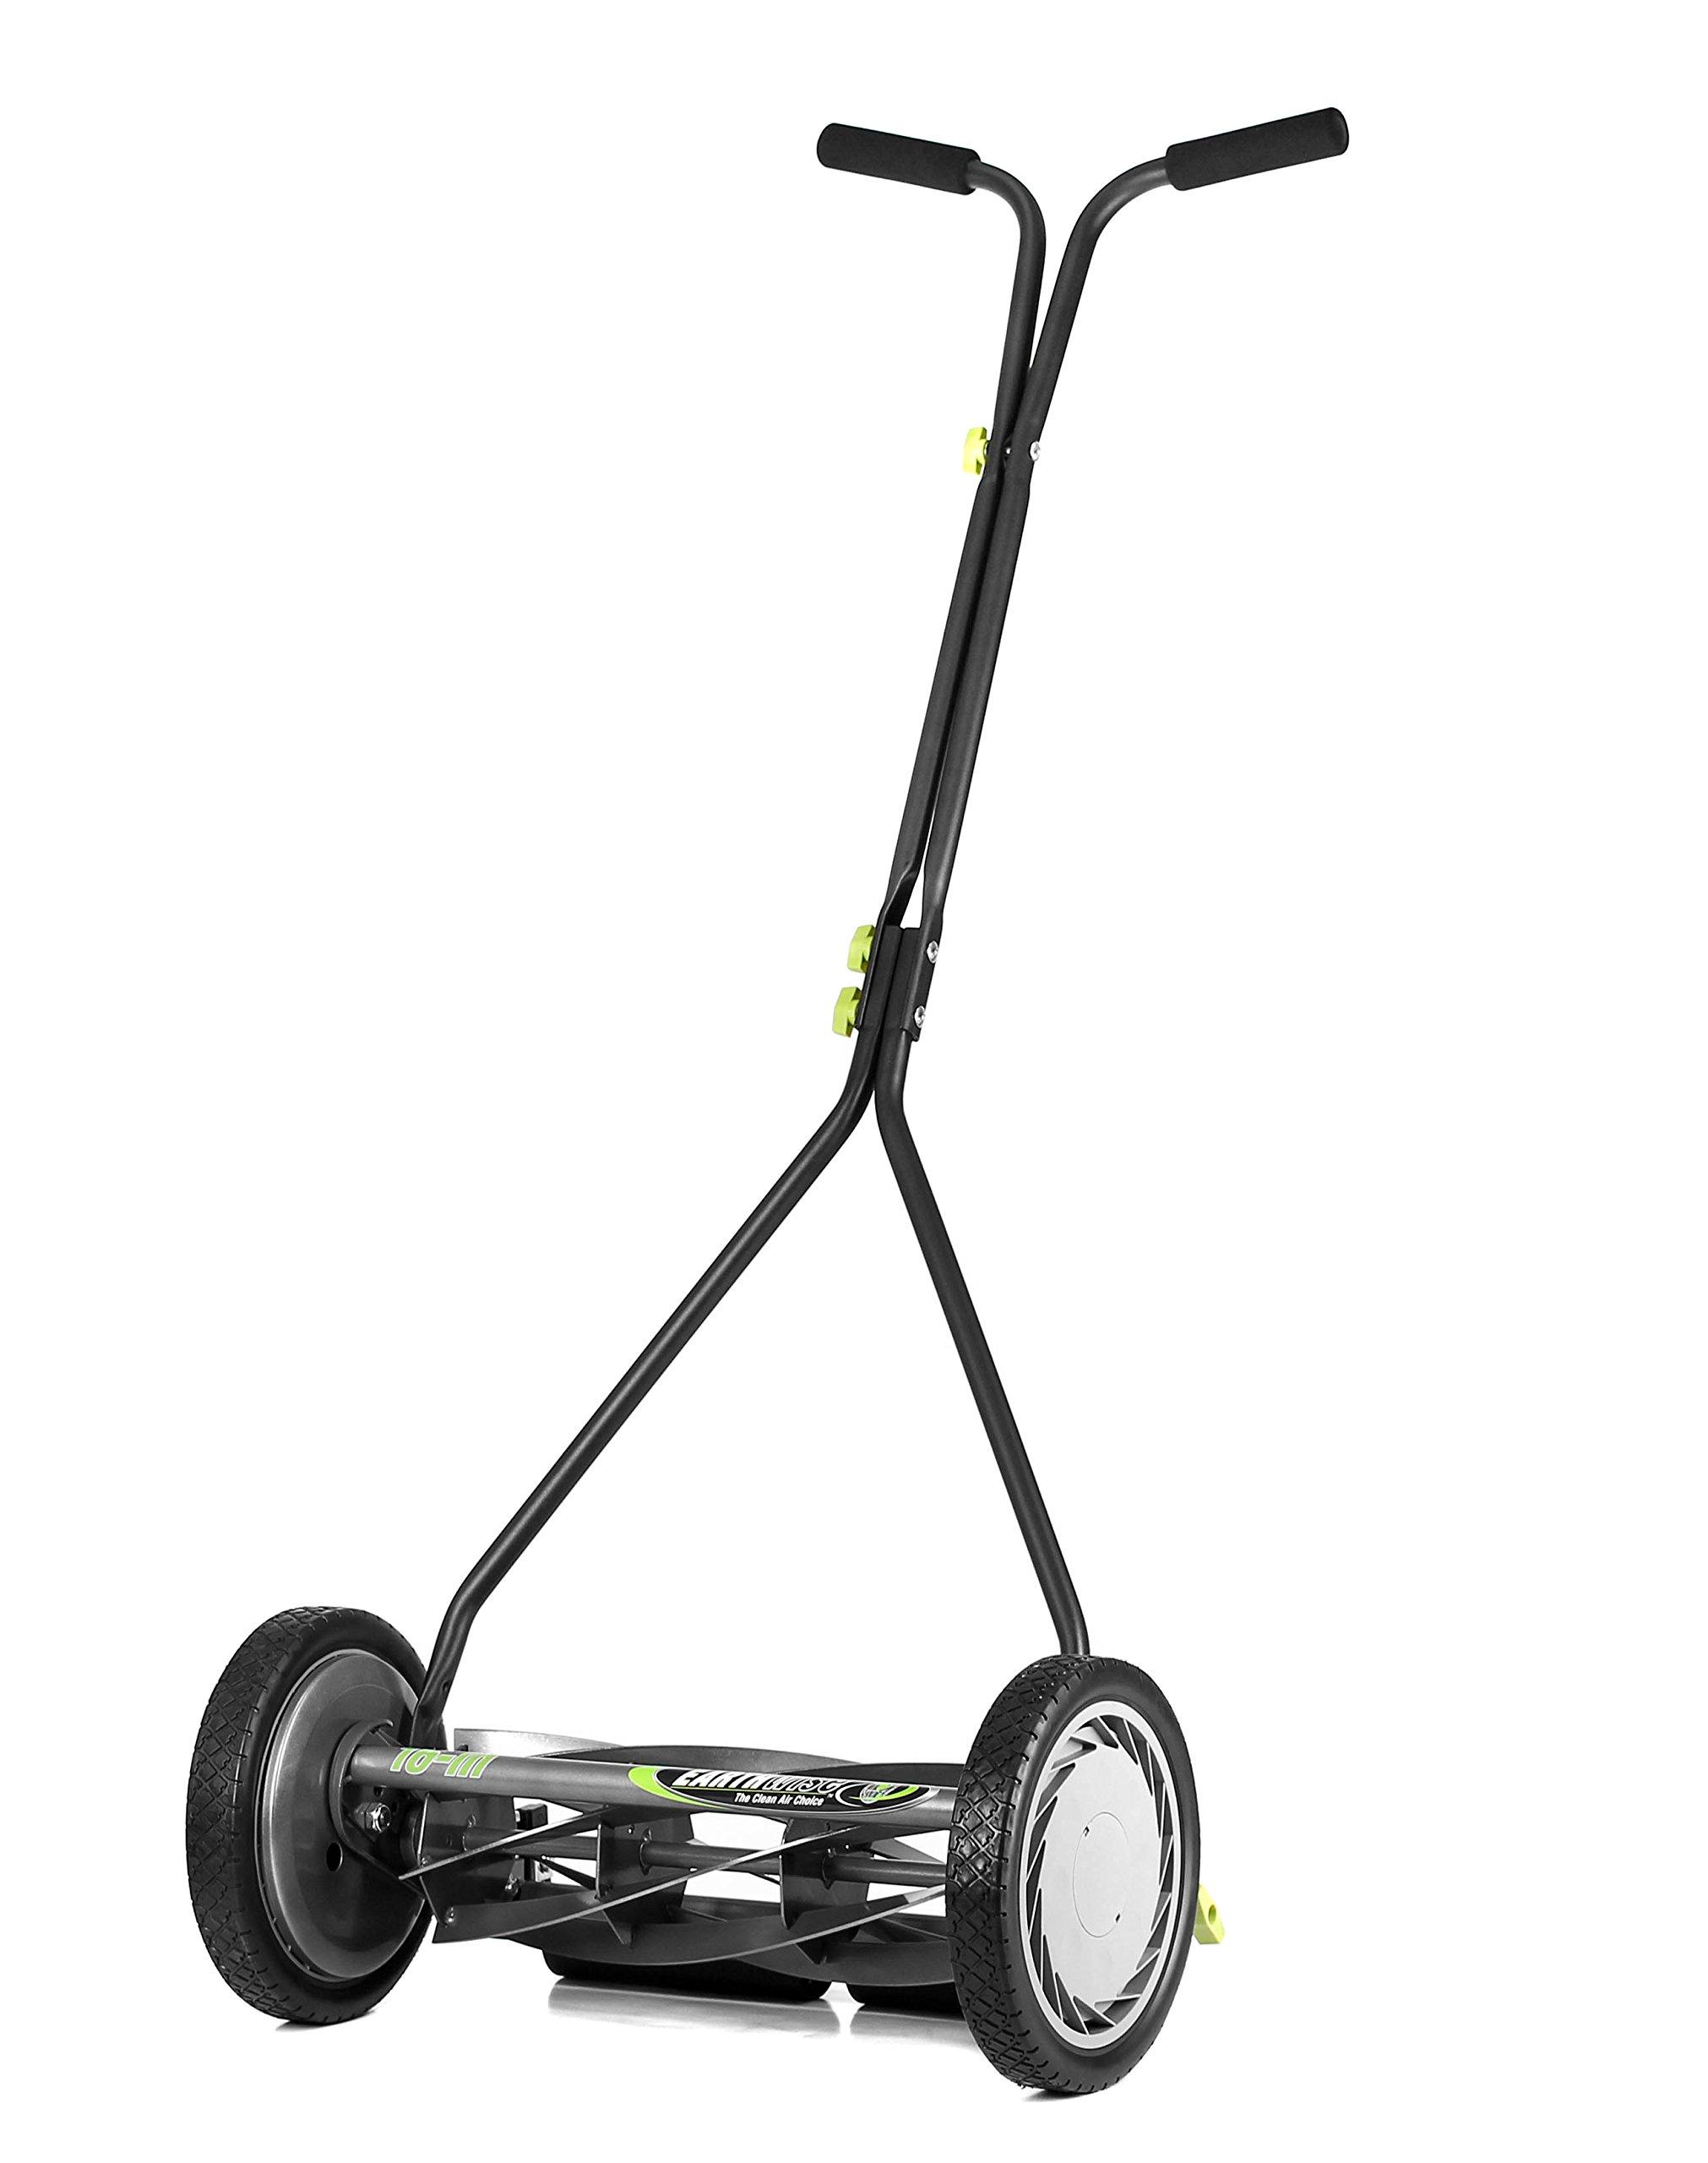 Earthwise 1715-16EW 16-Inch 7-Blade Push Reel Lawn Mower, Gray/Silver/Green by Earthwise